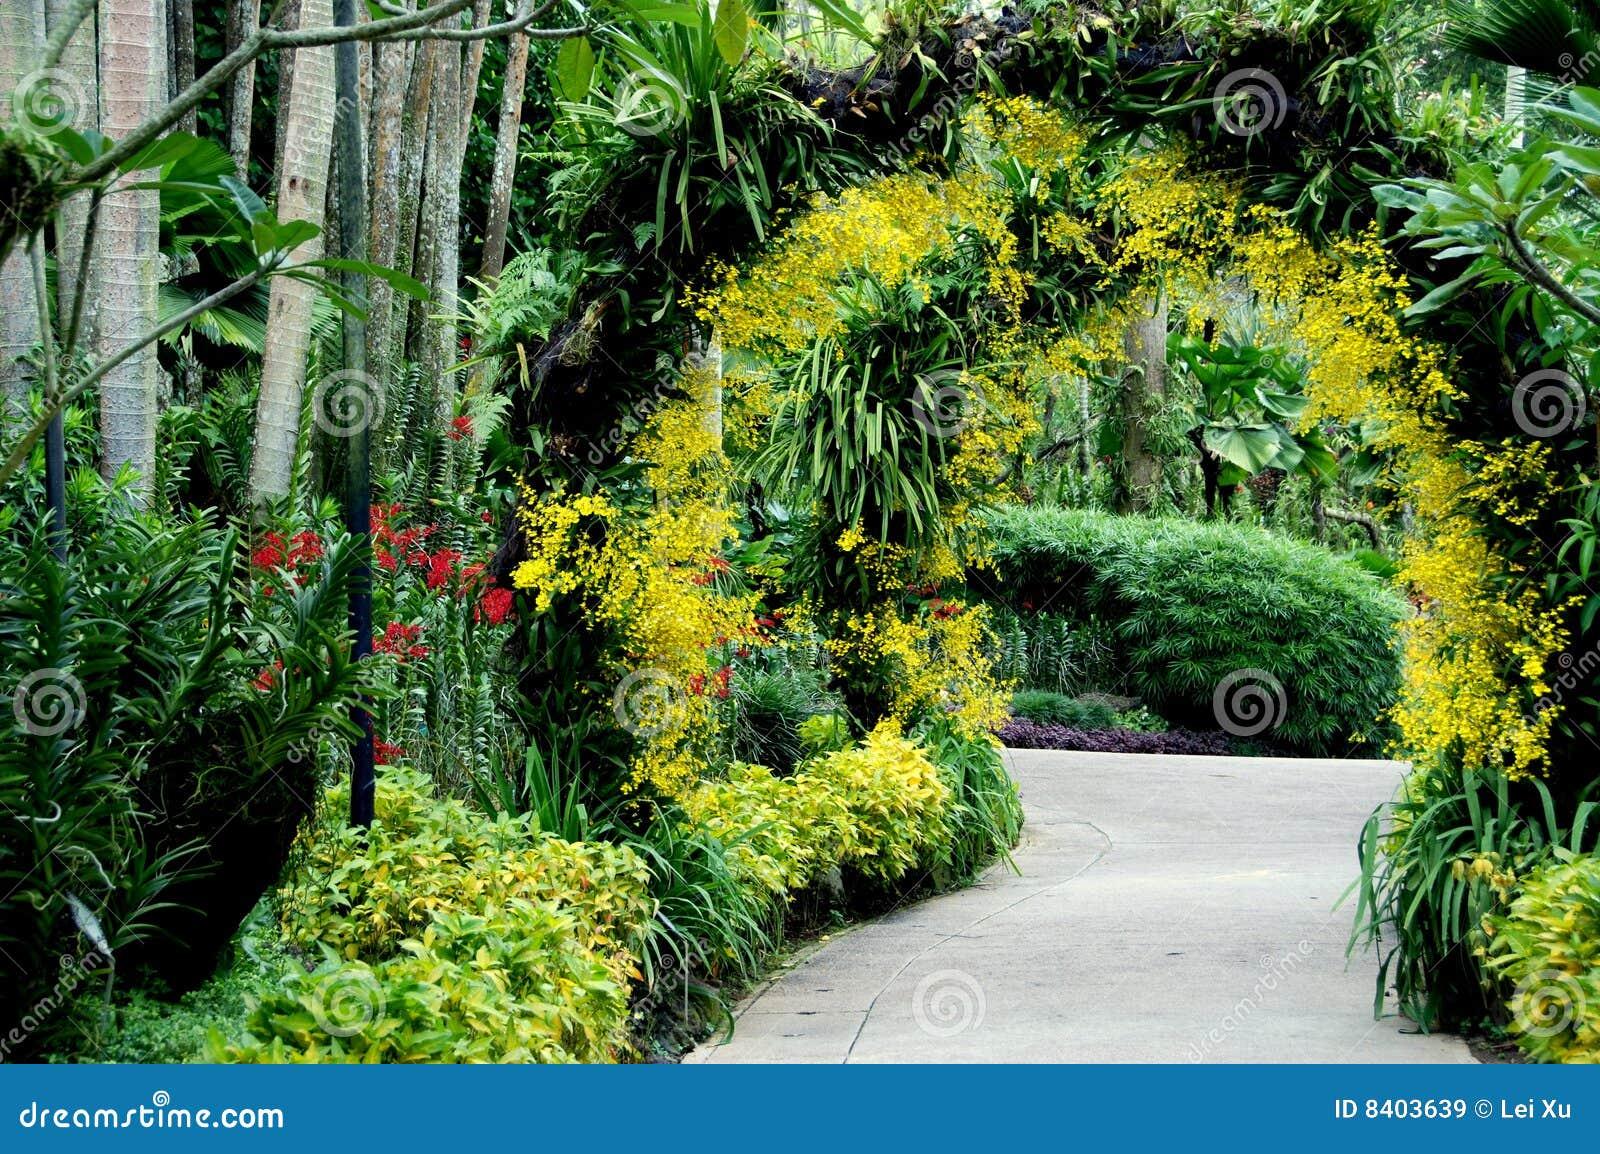 Singapore national orchid garden stock image image 8403639 for Jardines de orquideas